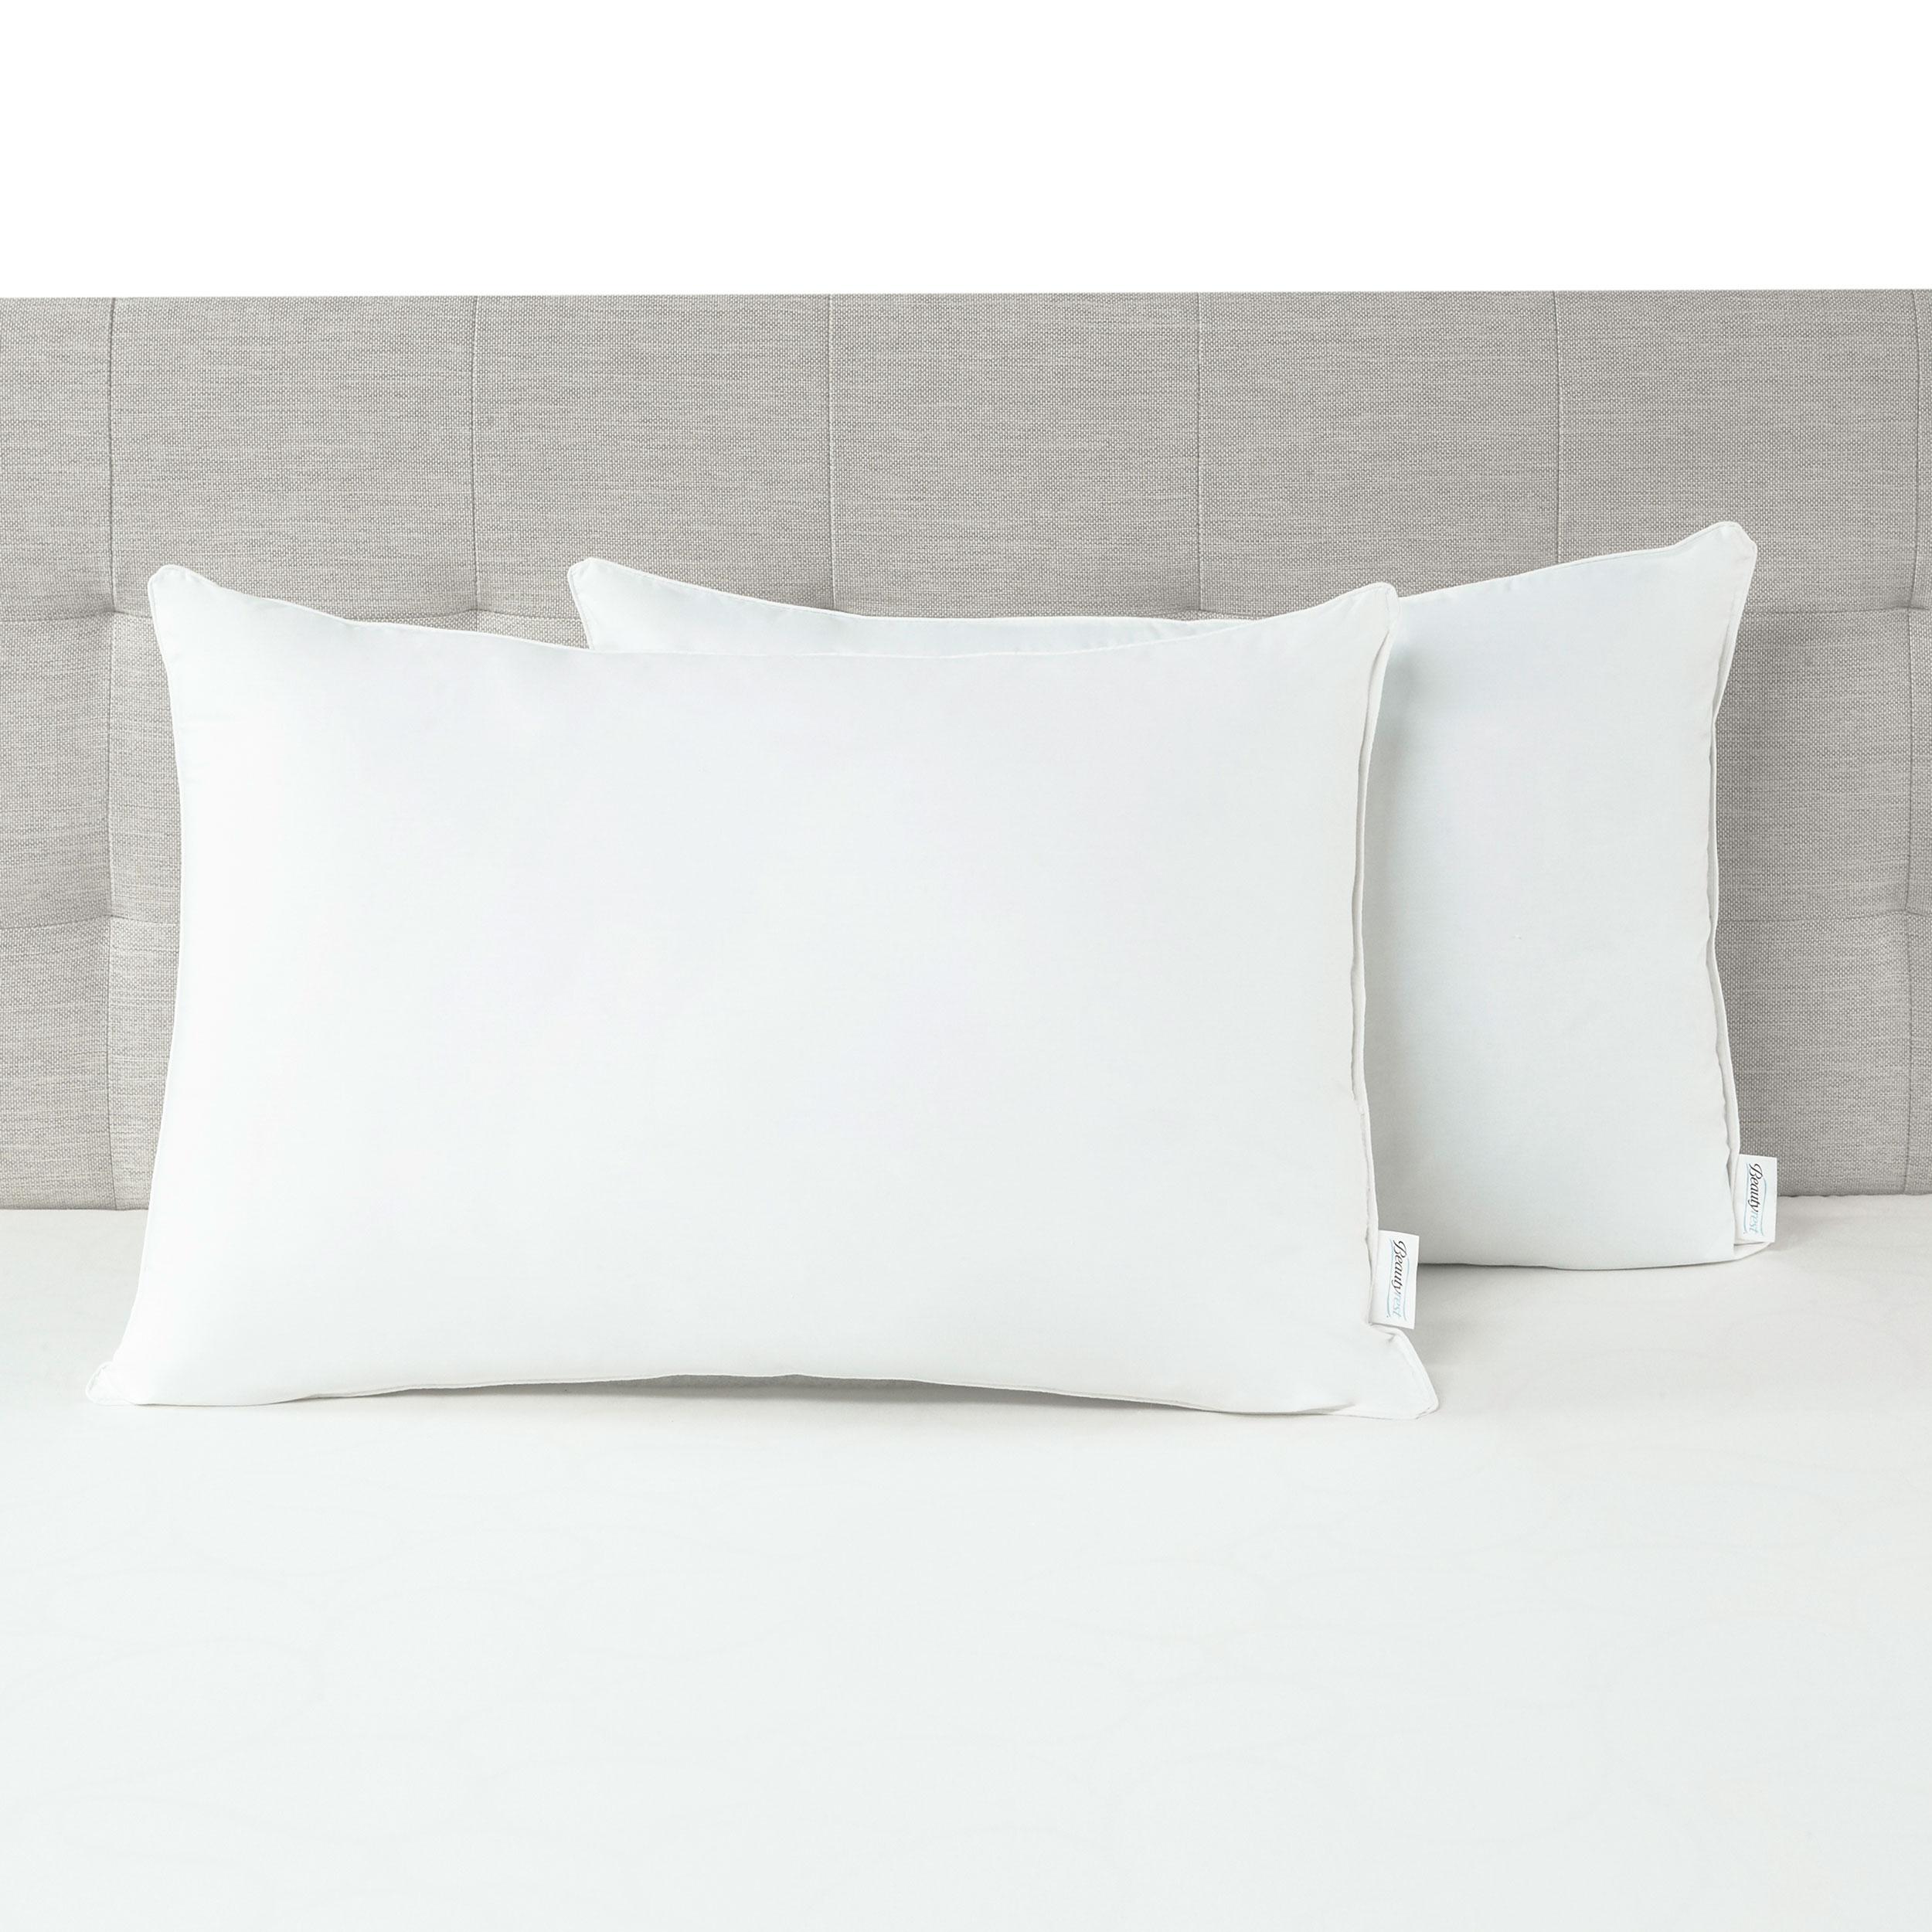 beautyrest cooling pillow matres image